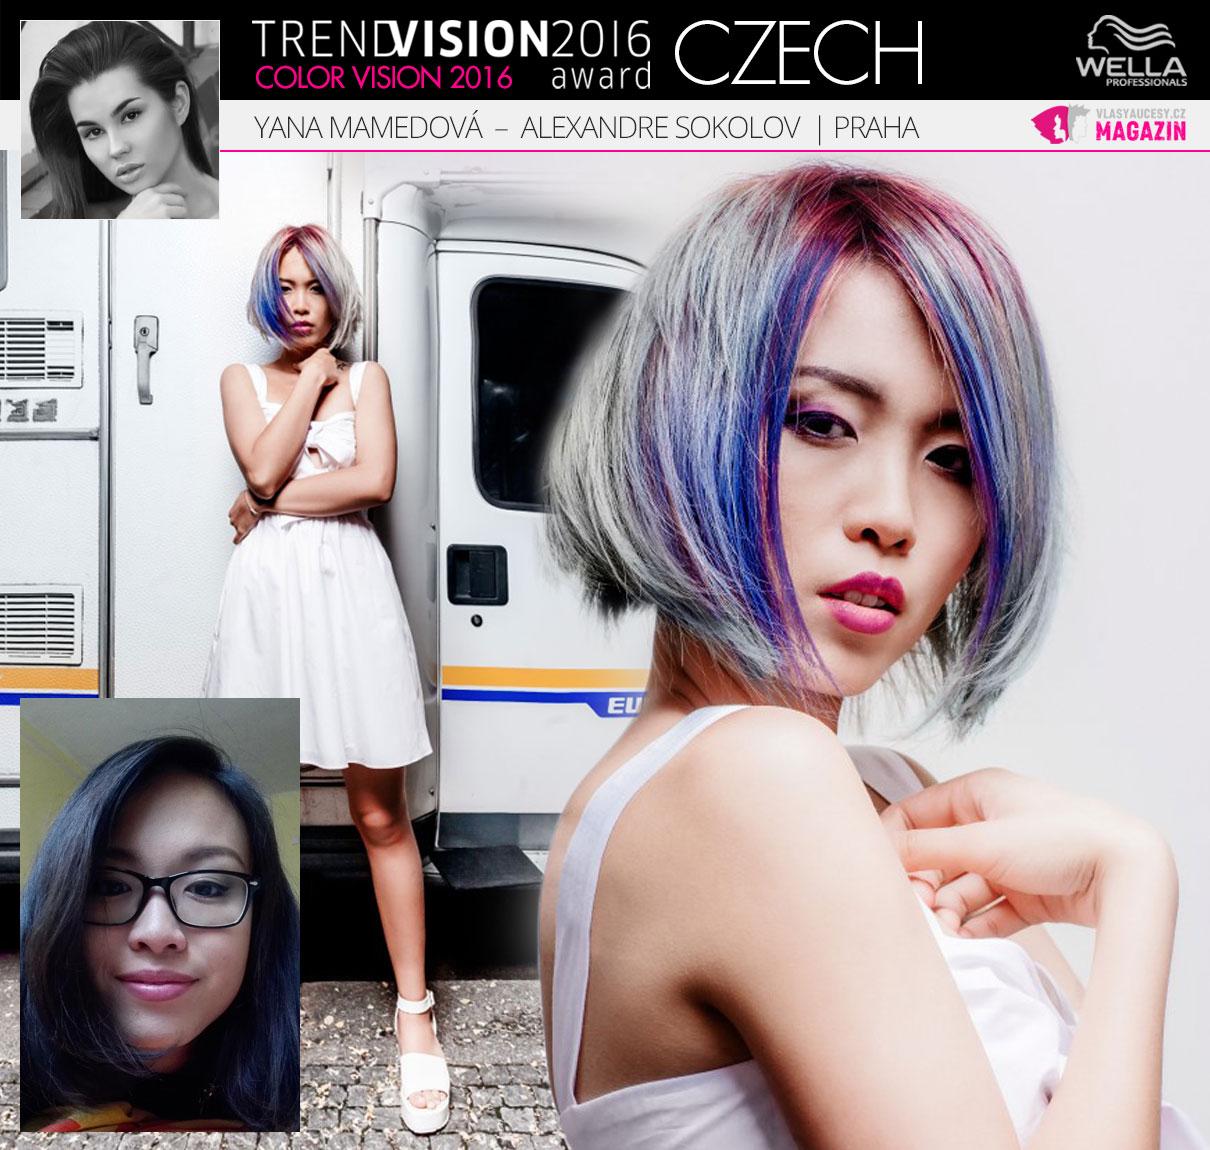 Yana Mamedova, Alexandre Sokolov studio de beauté, Praha –Wella Professionals Trend Vision Award Česká republika, kategorie Color Vision 2016.